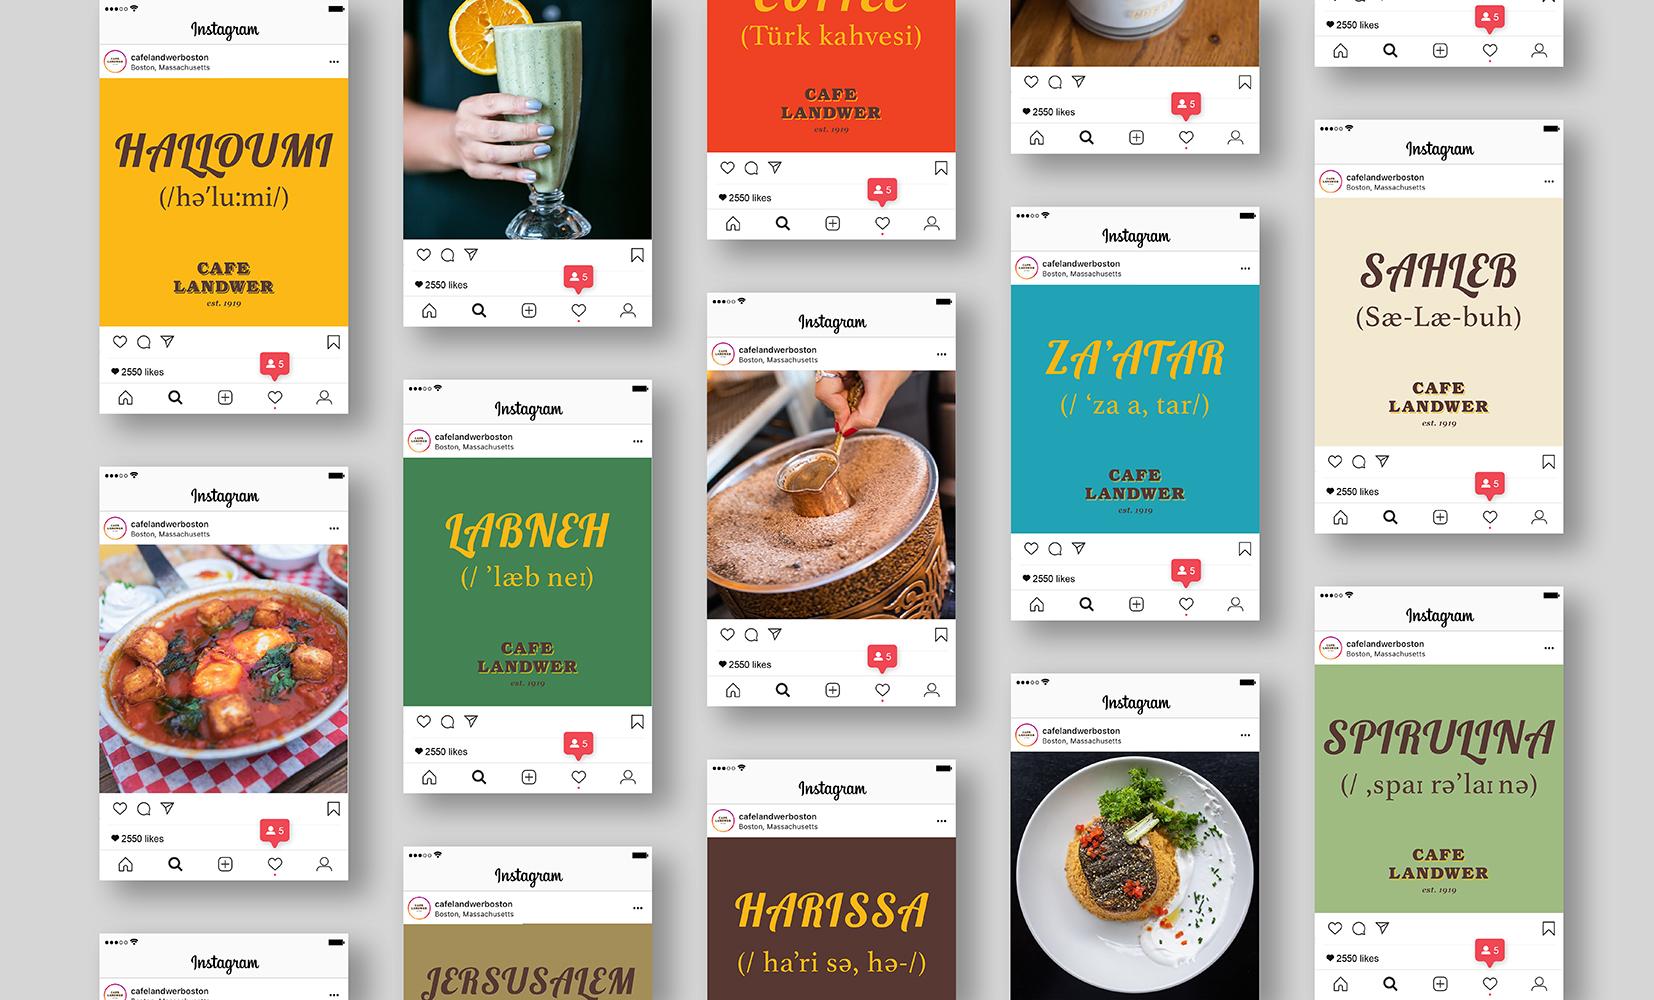 Cafe Landwer Instagram Content